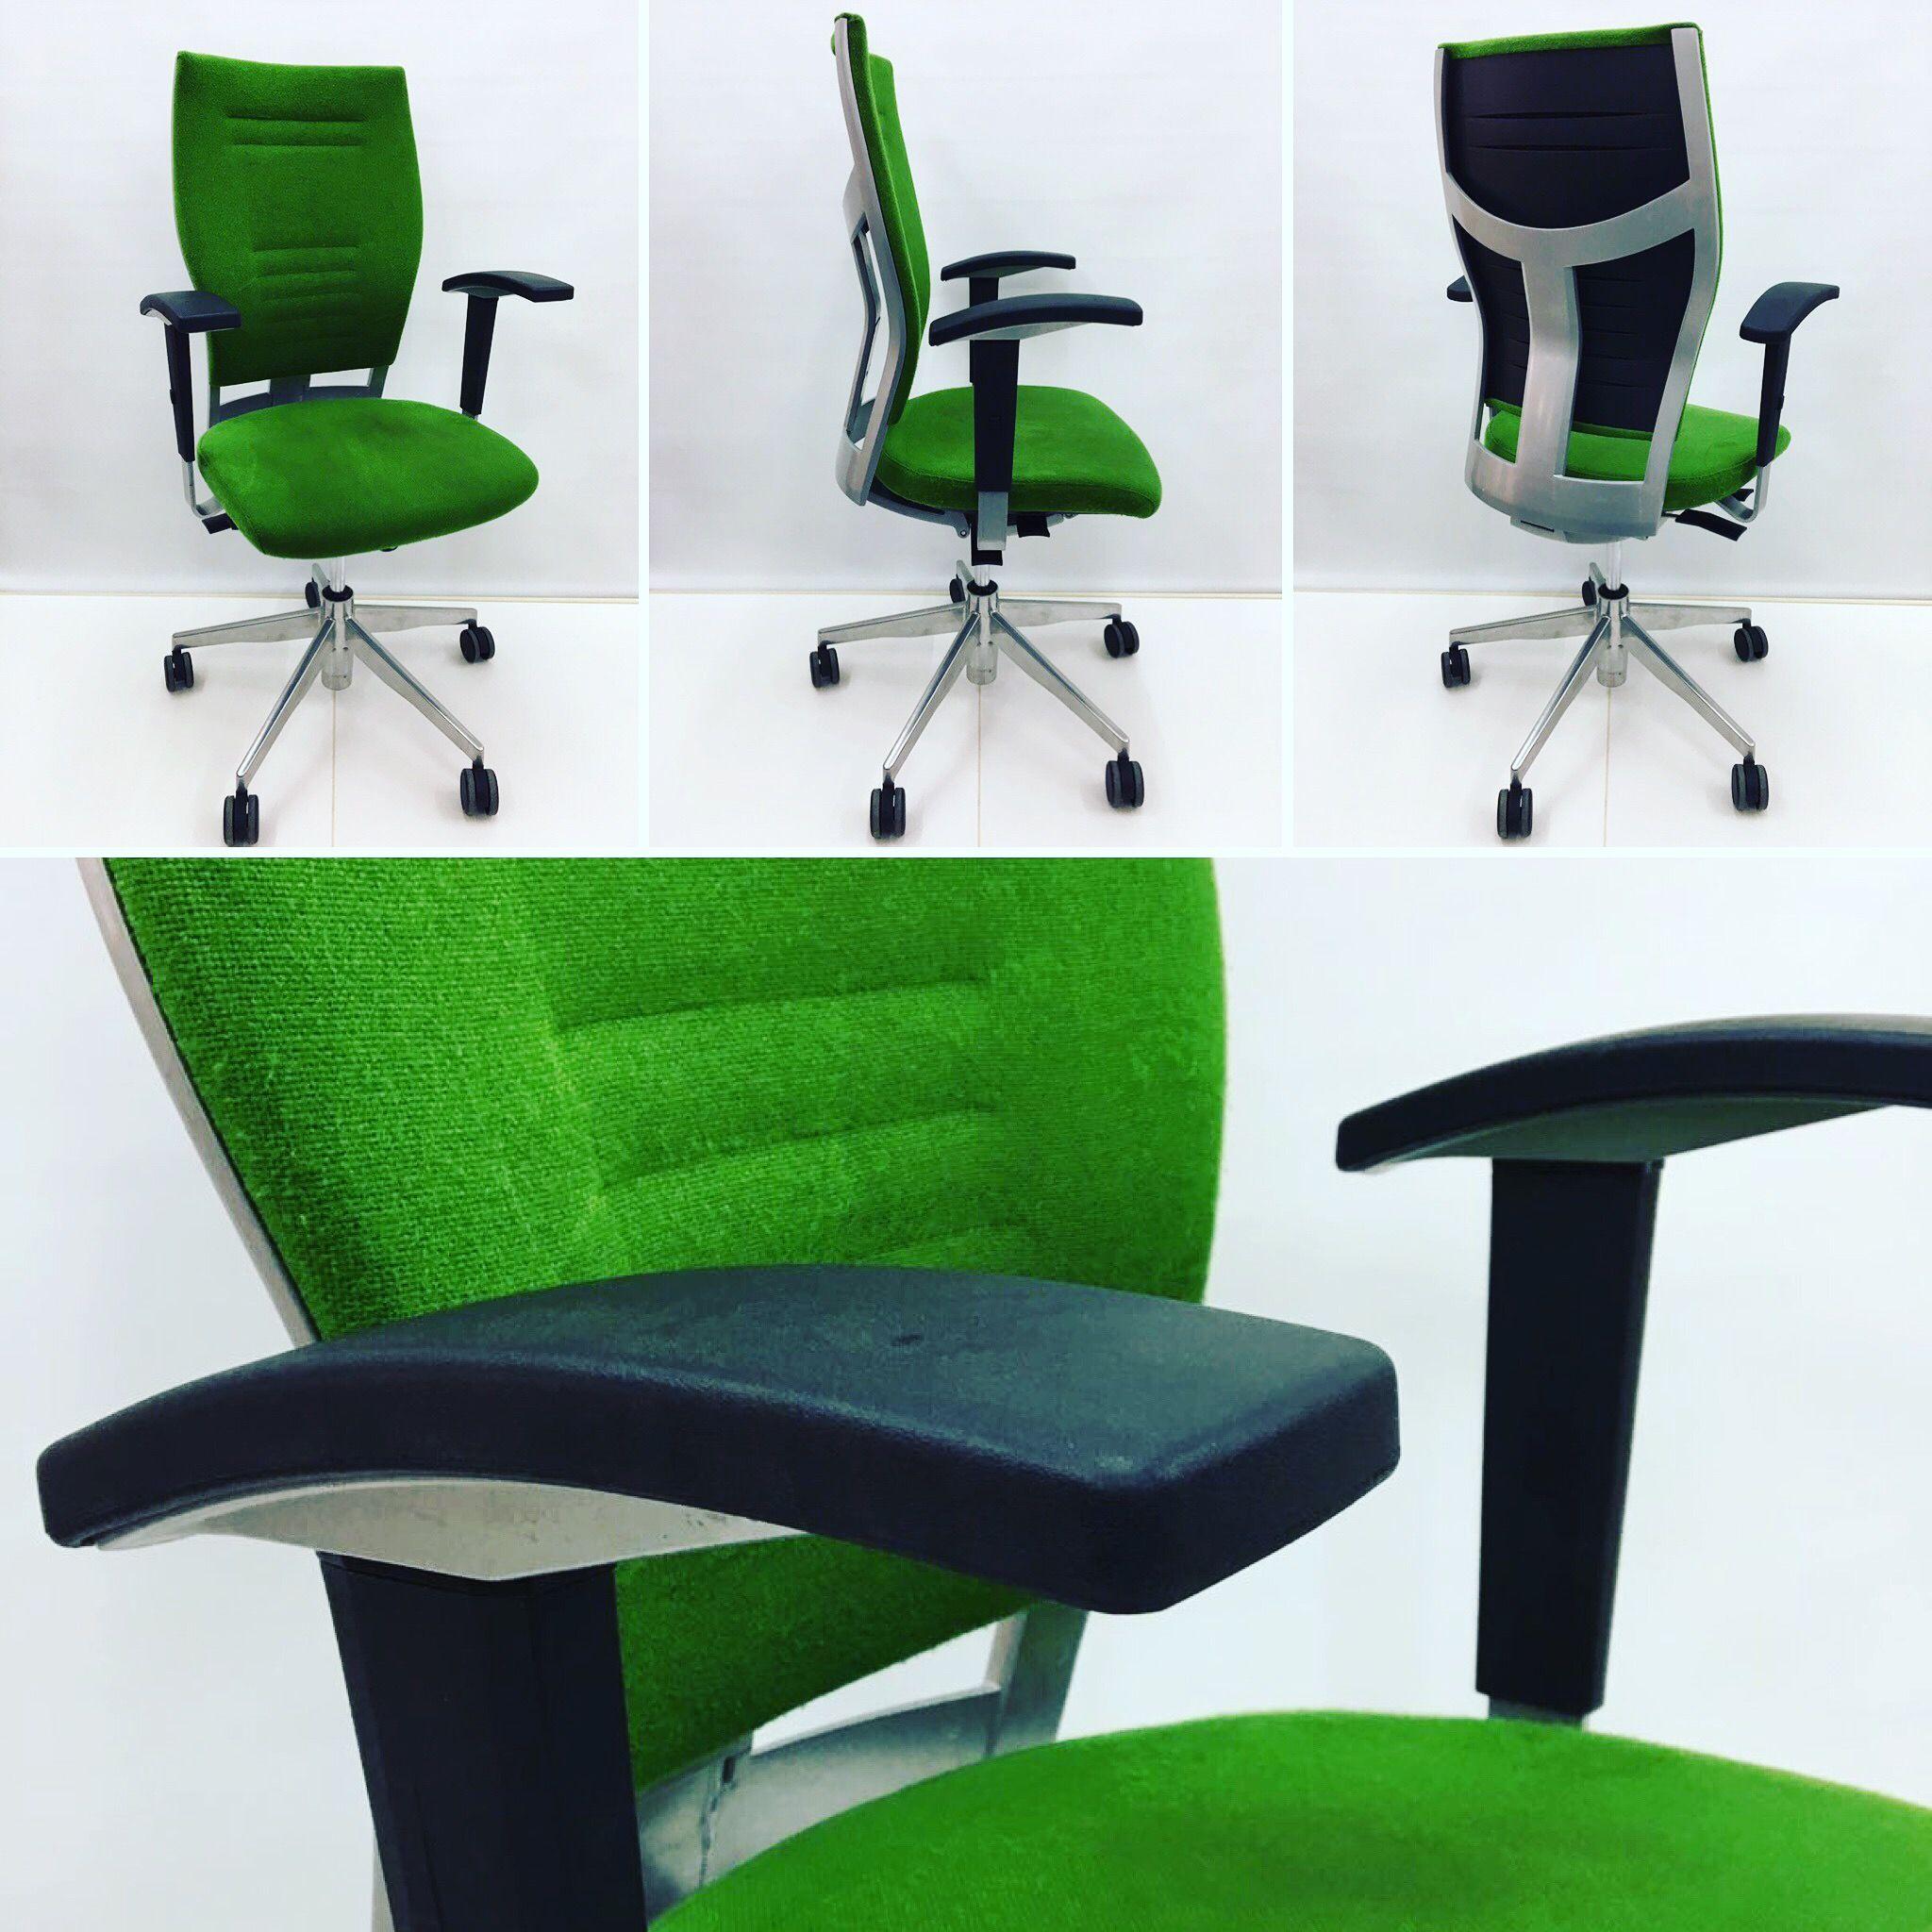 Silla verde #dynamobel 💯€ #ergonomica #outlet #silladeoficina ...